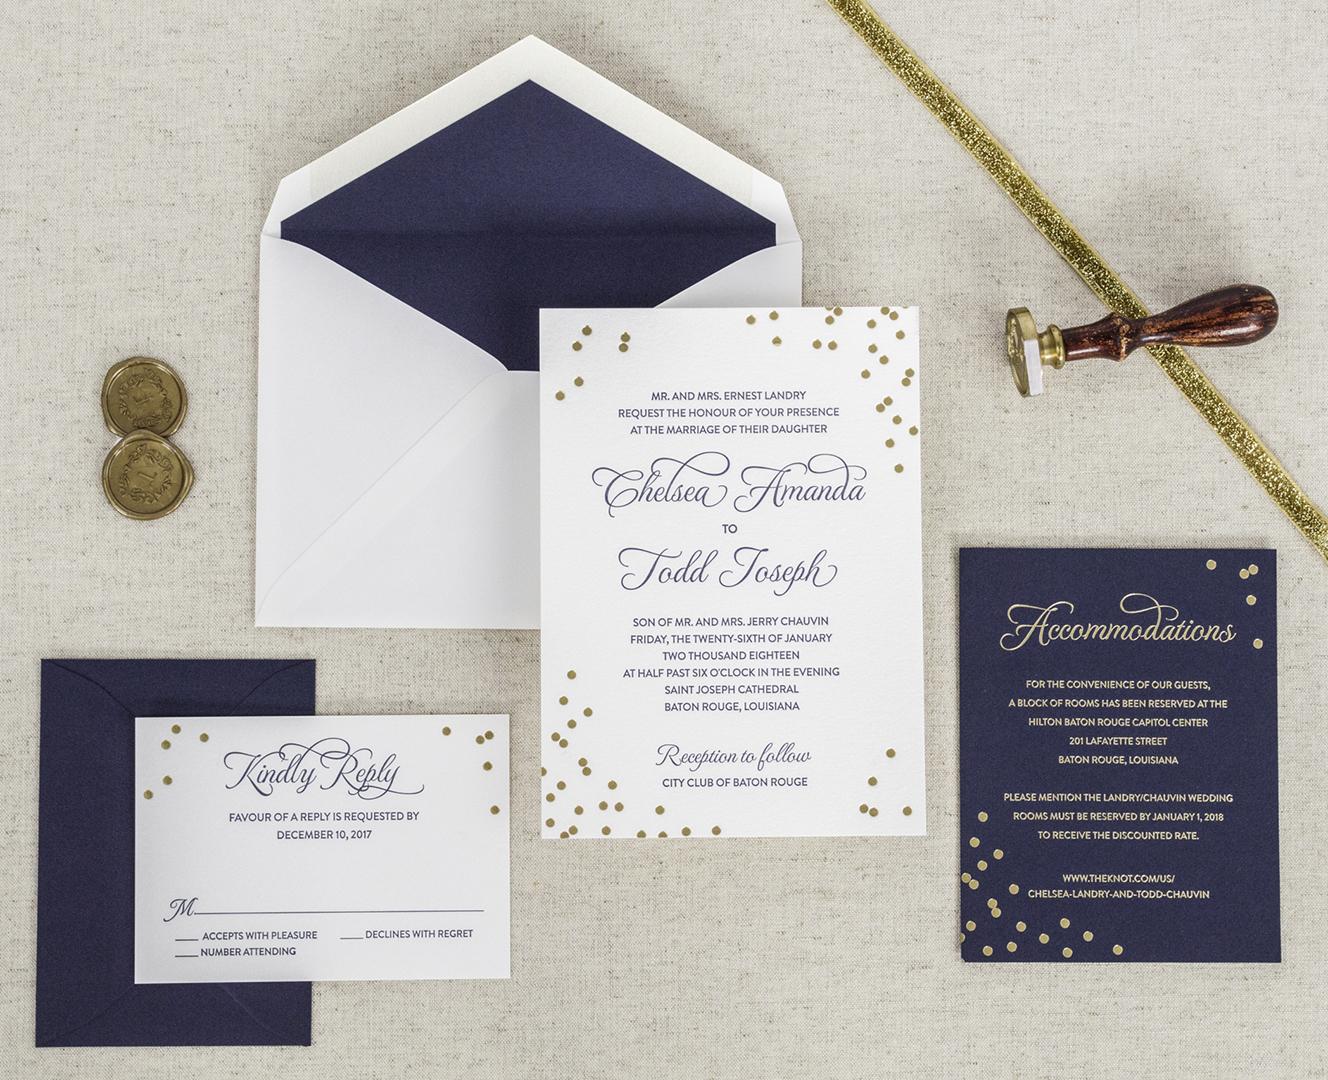 Cheap Letterpress Wedding Invitations: Affordable Letterpress Wedding Invitations